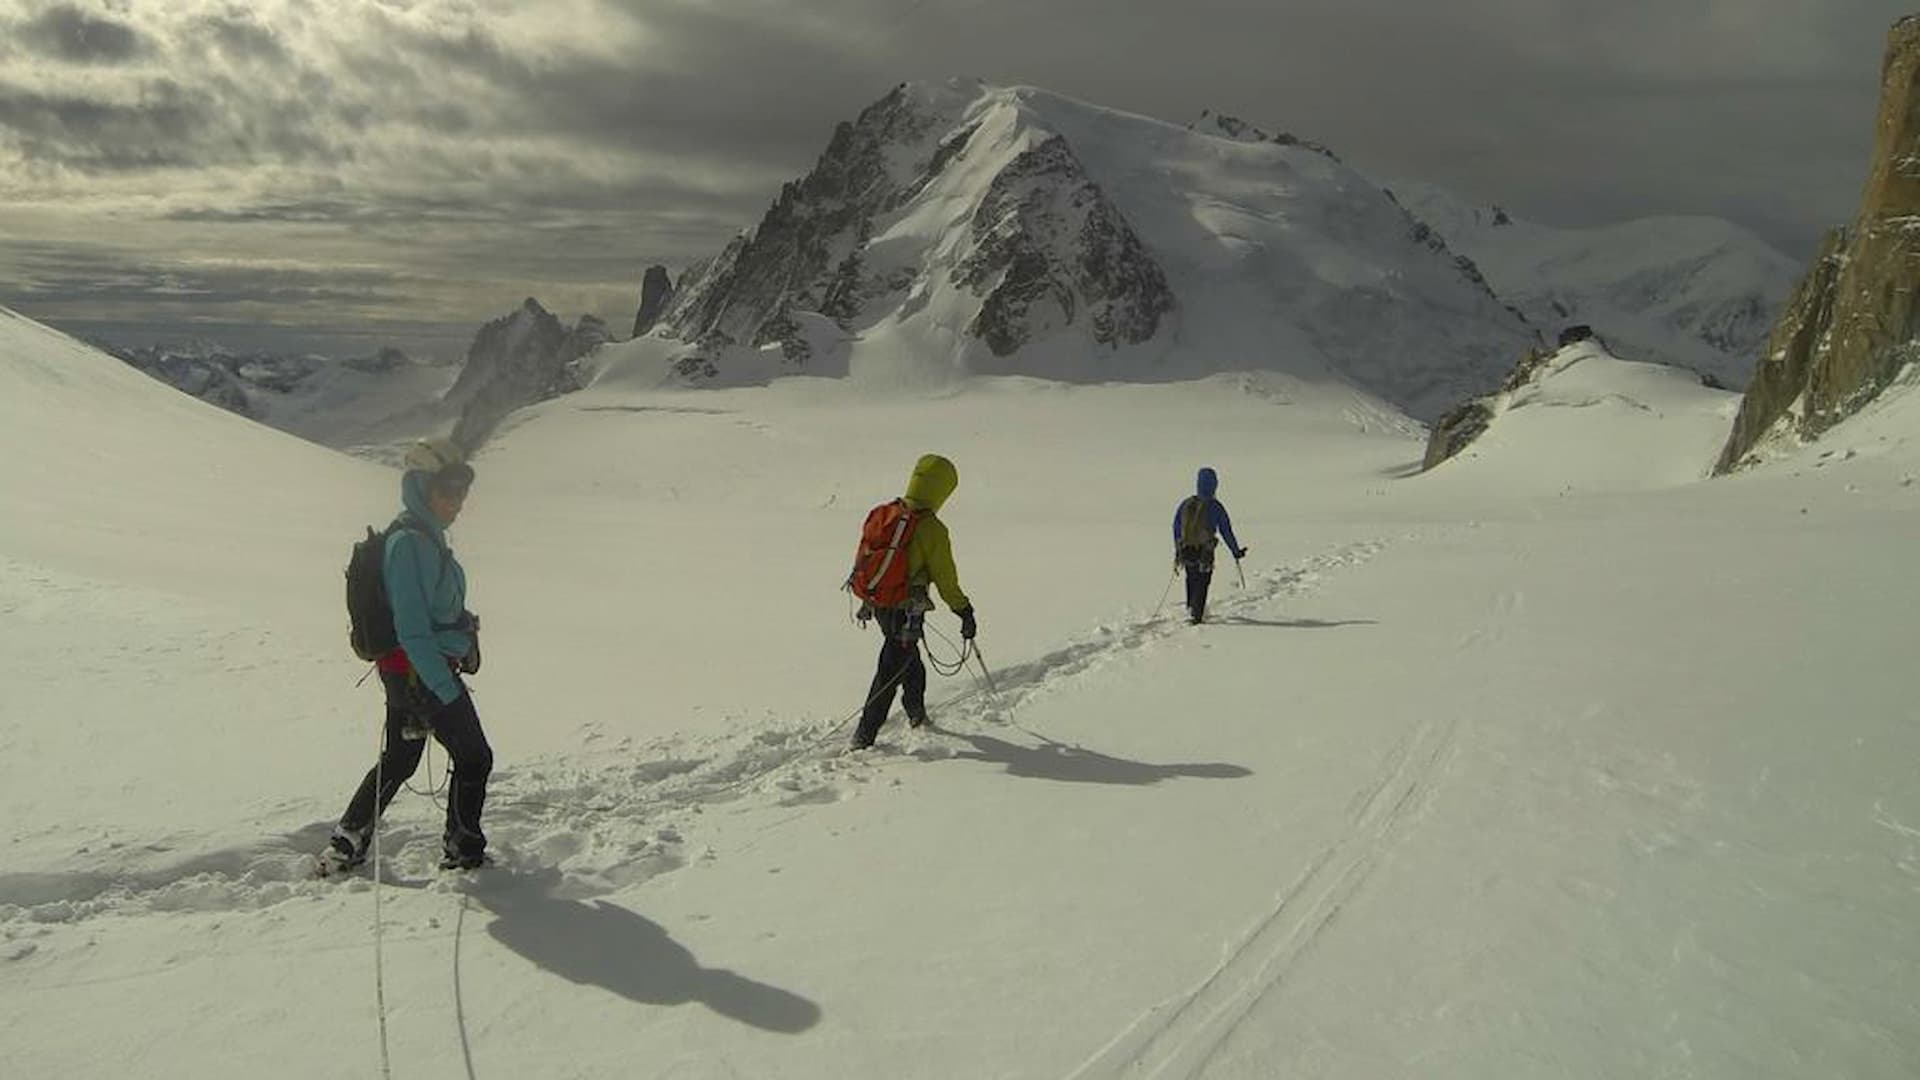 Winter Hiking Skills Course - 3 days